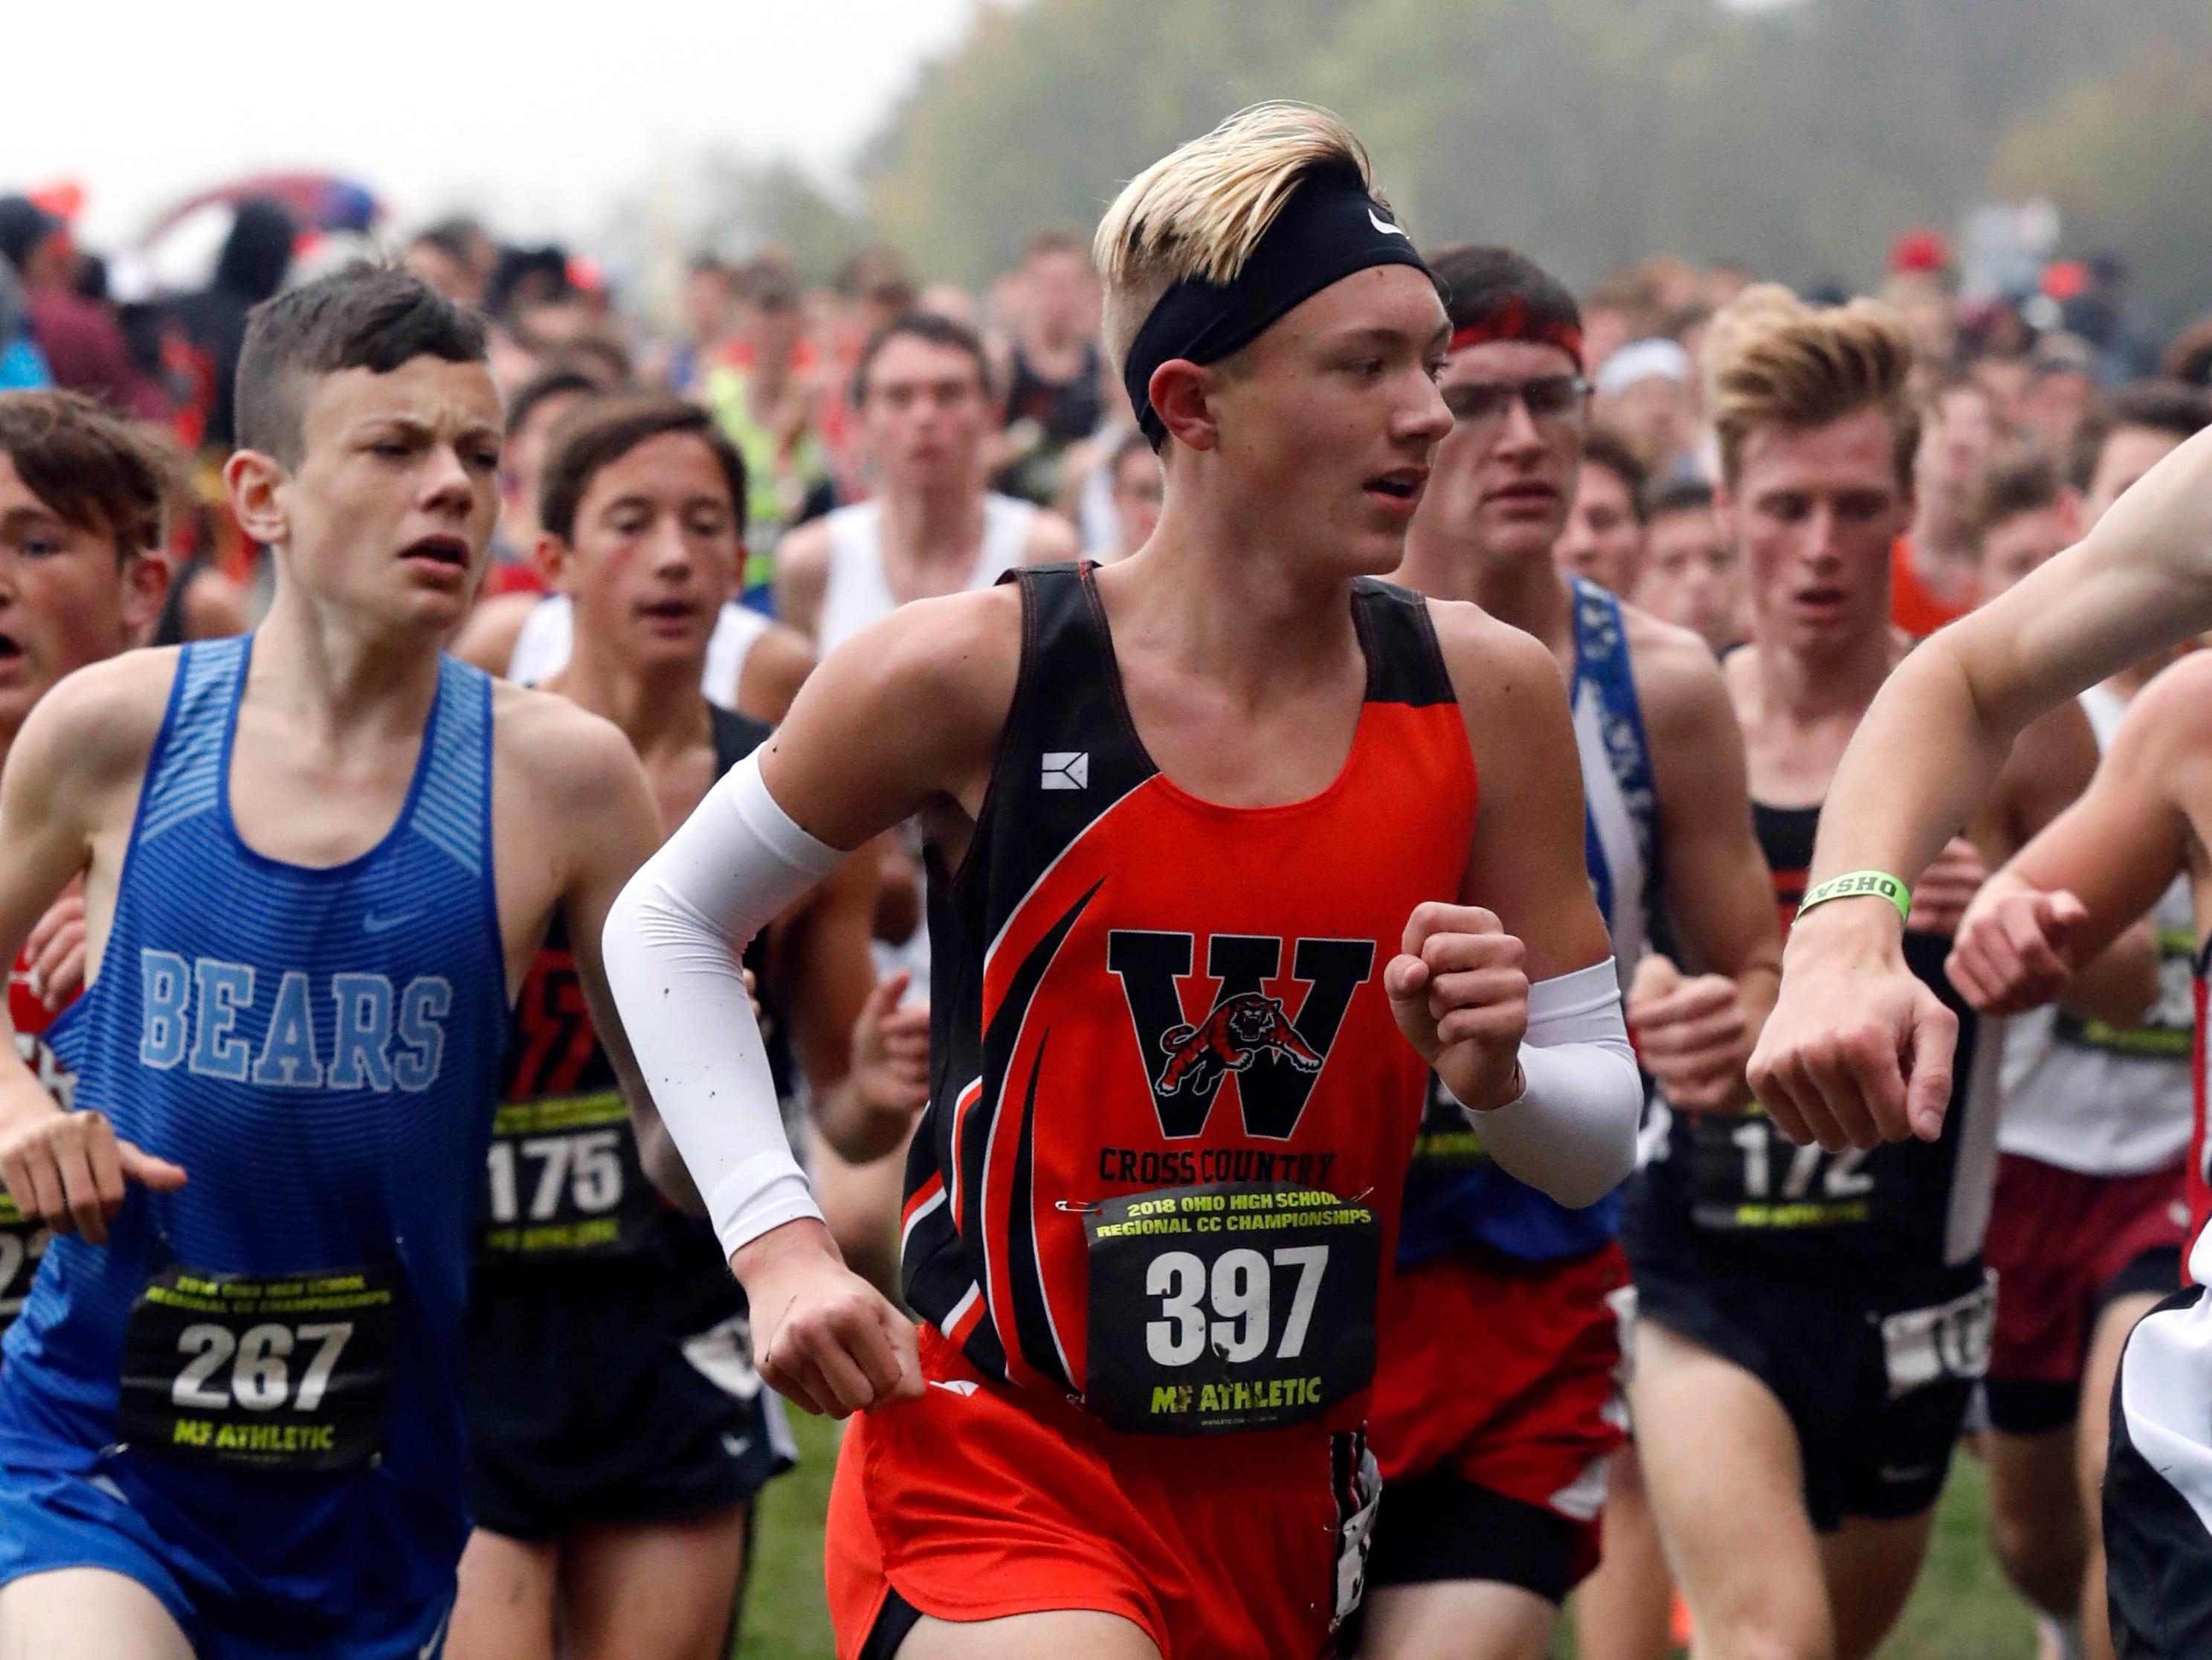 Waverly's Jack Monroe runs in the Regional Cross Country meet Saturday, Oct. 27, 2018, at Pickerington North High School in Pickerington.